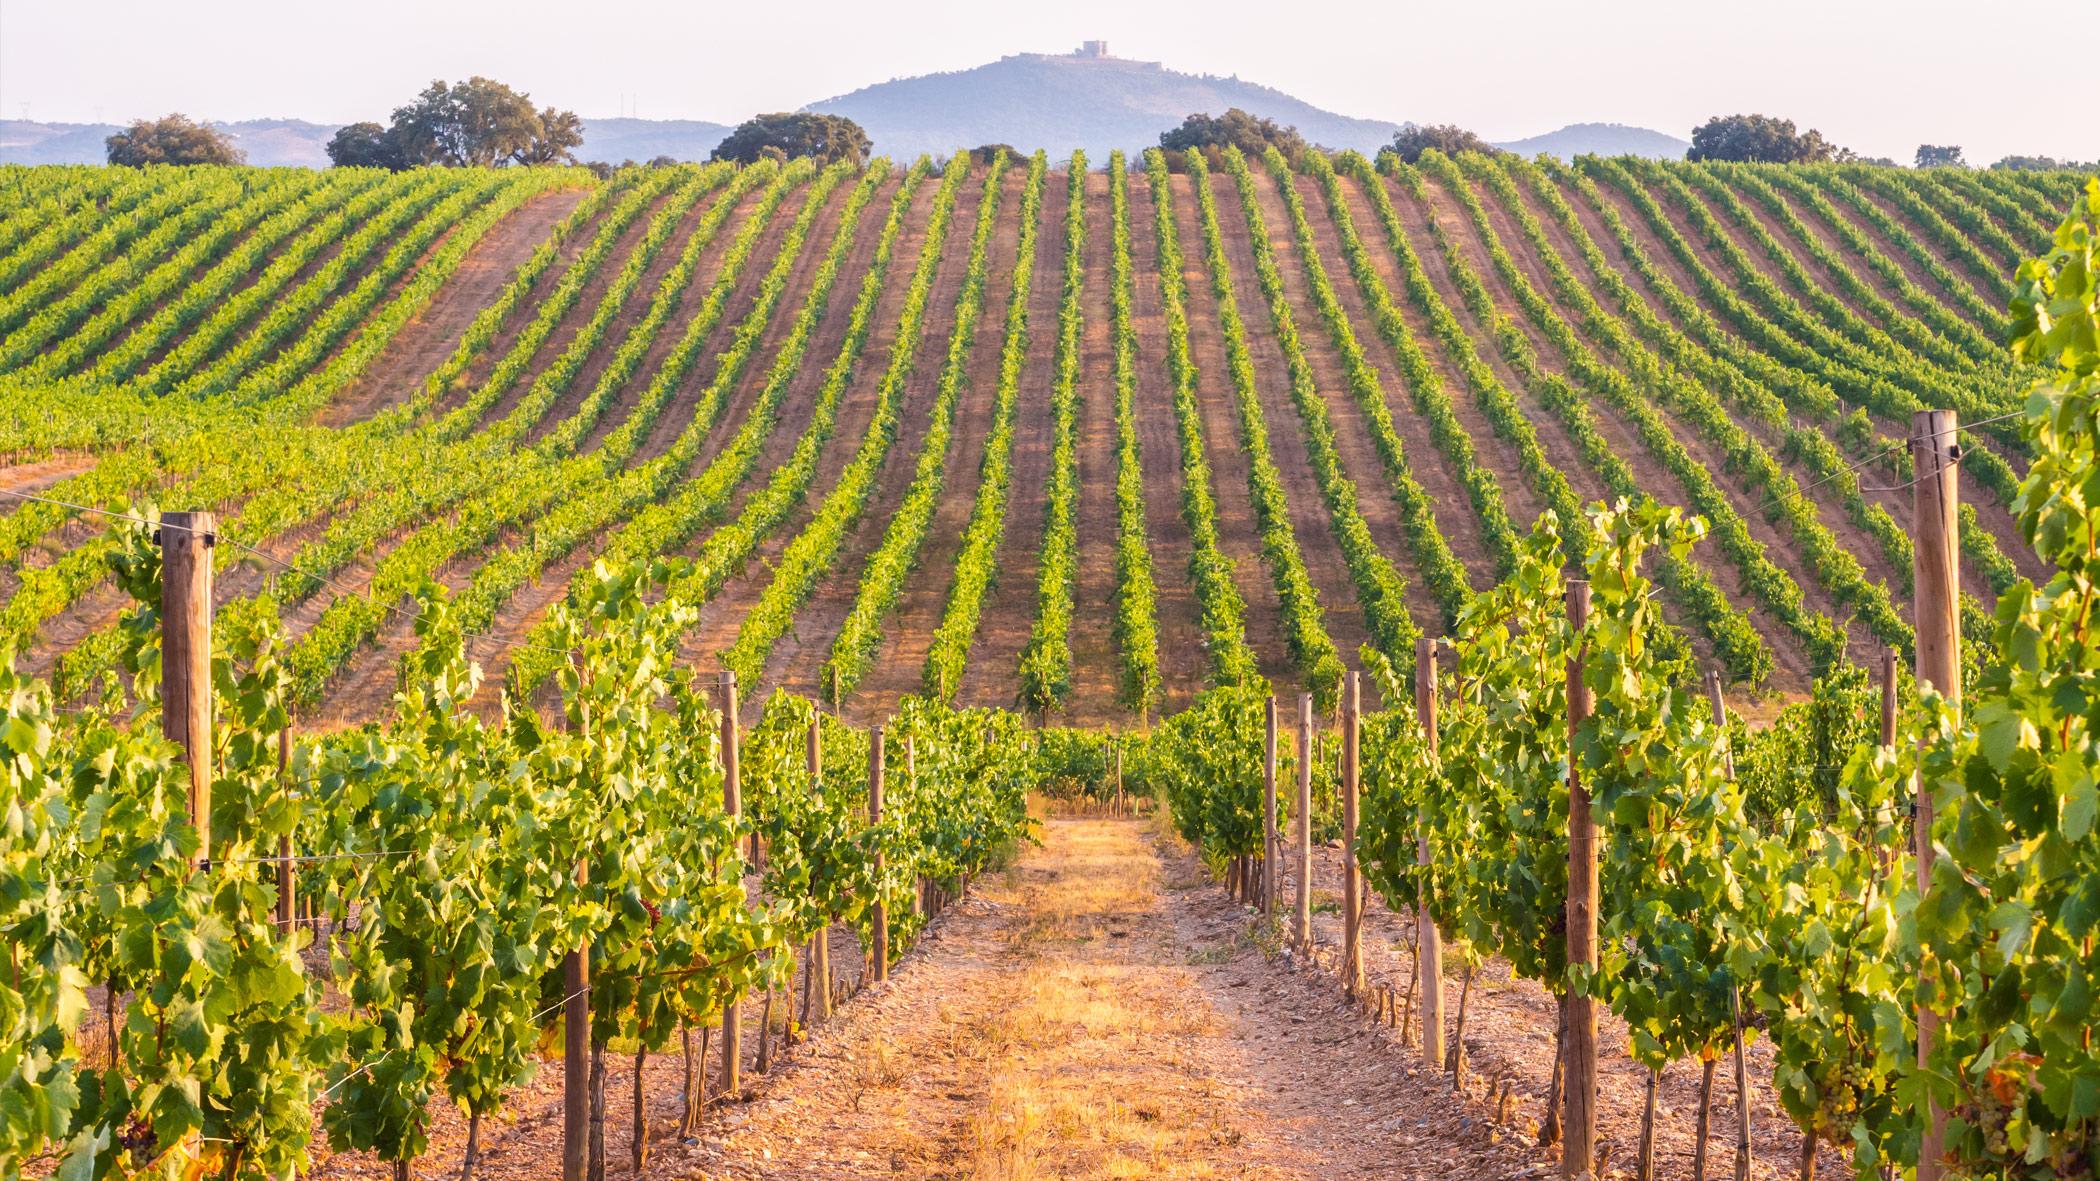 Wine Tourism and Rural Development